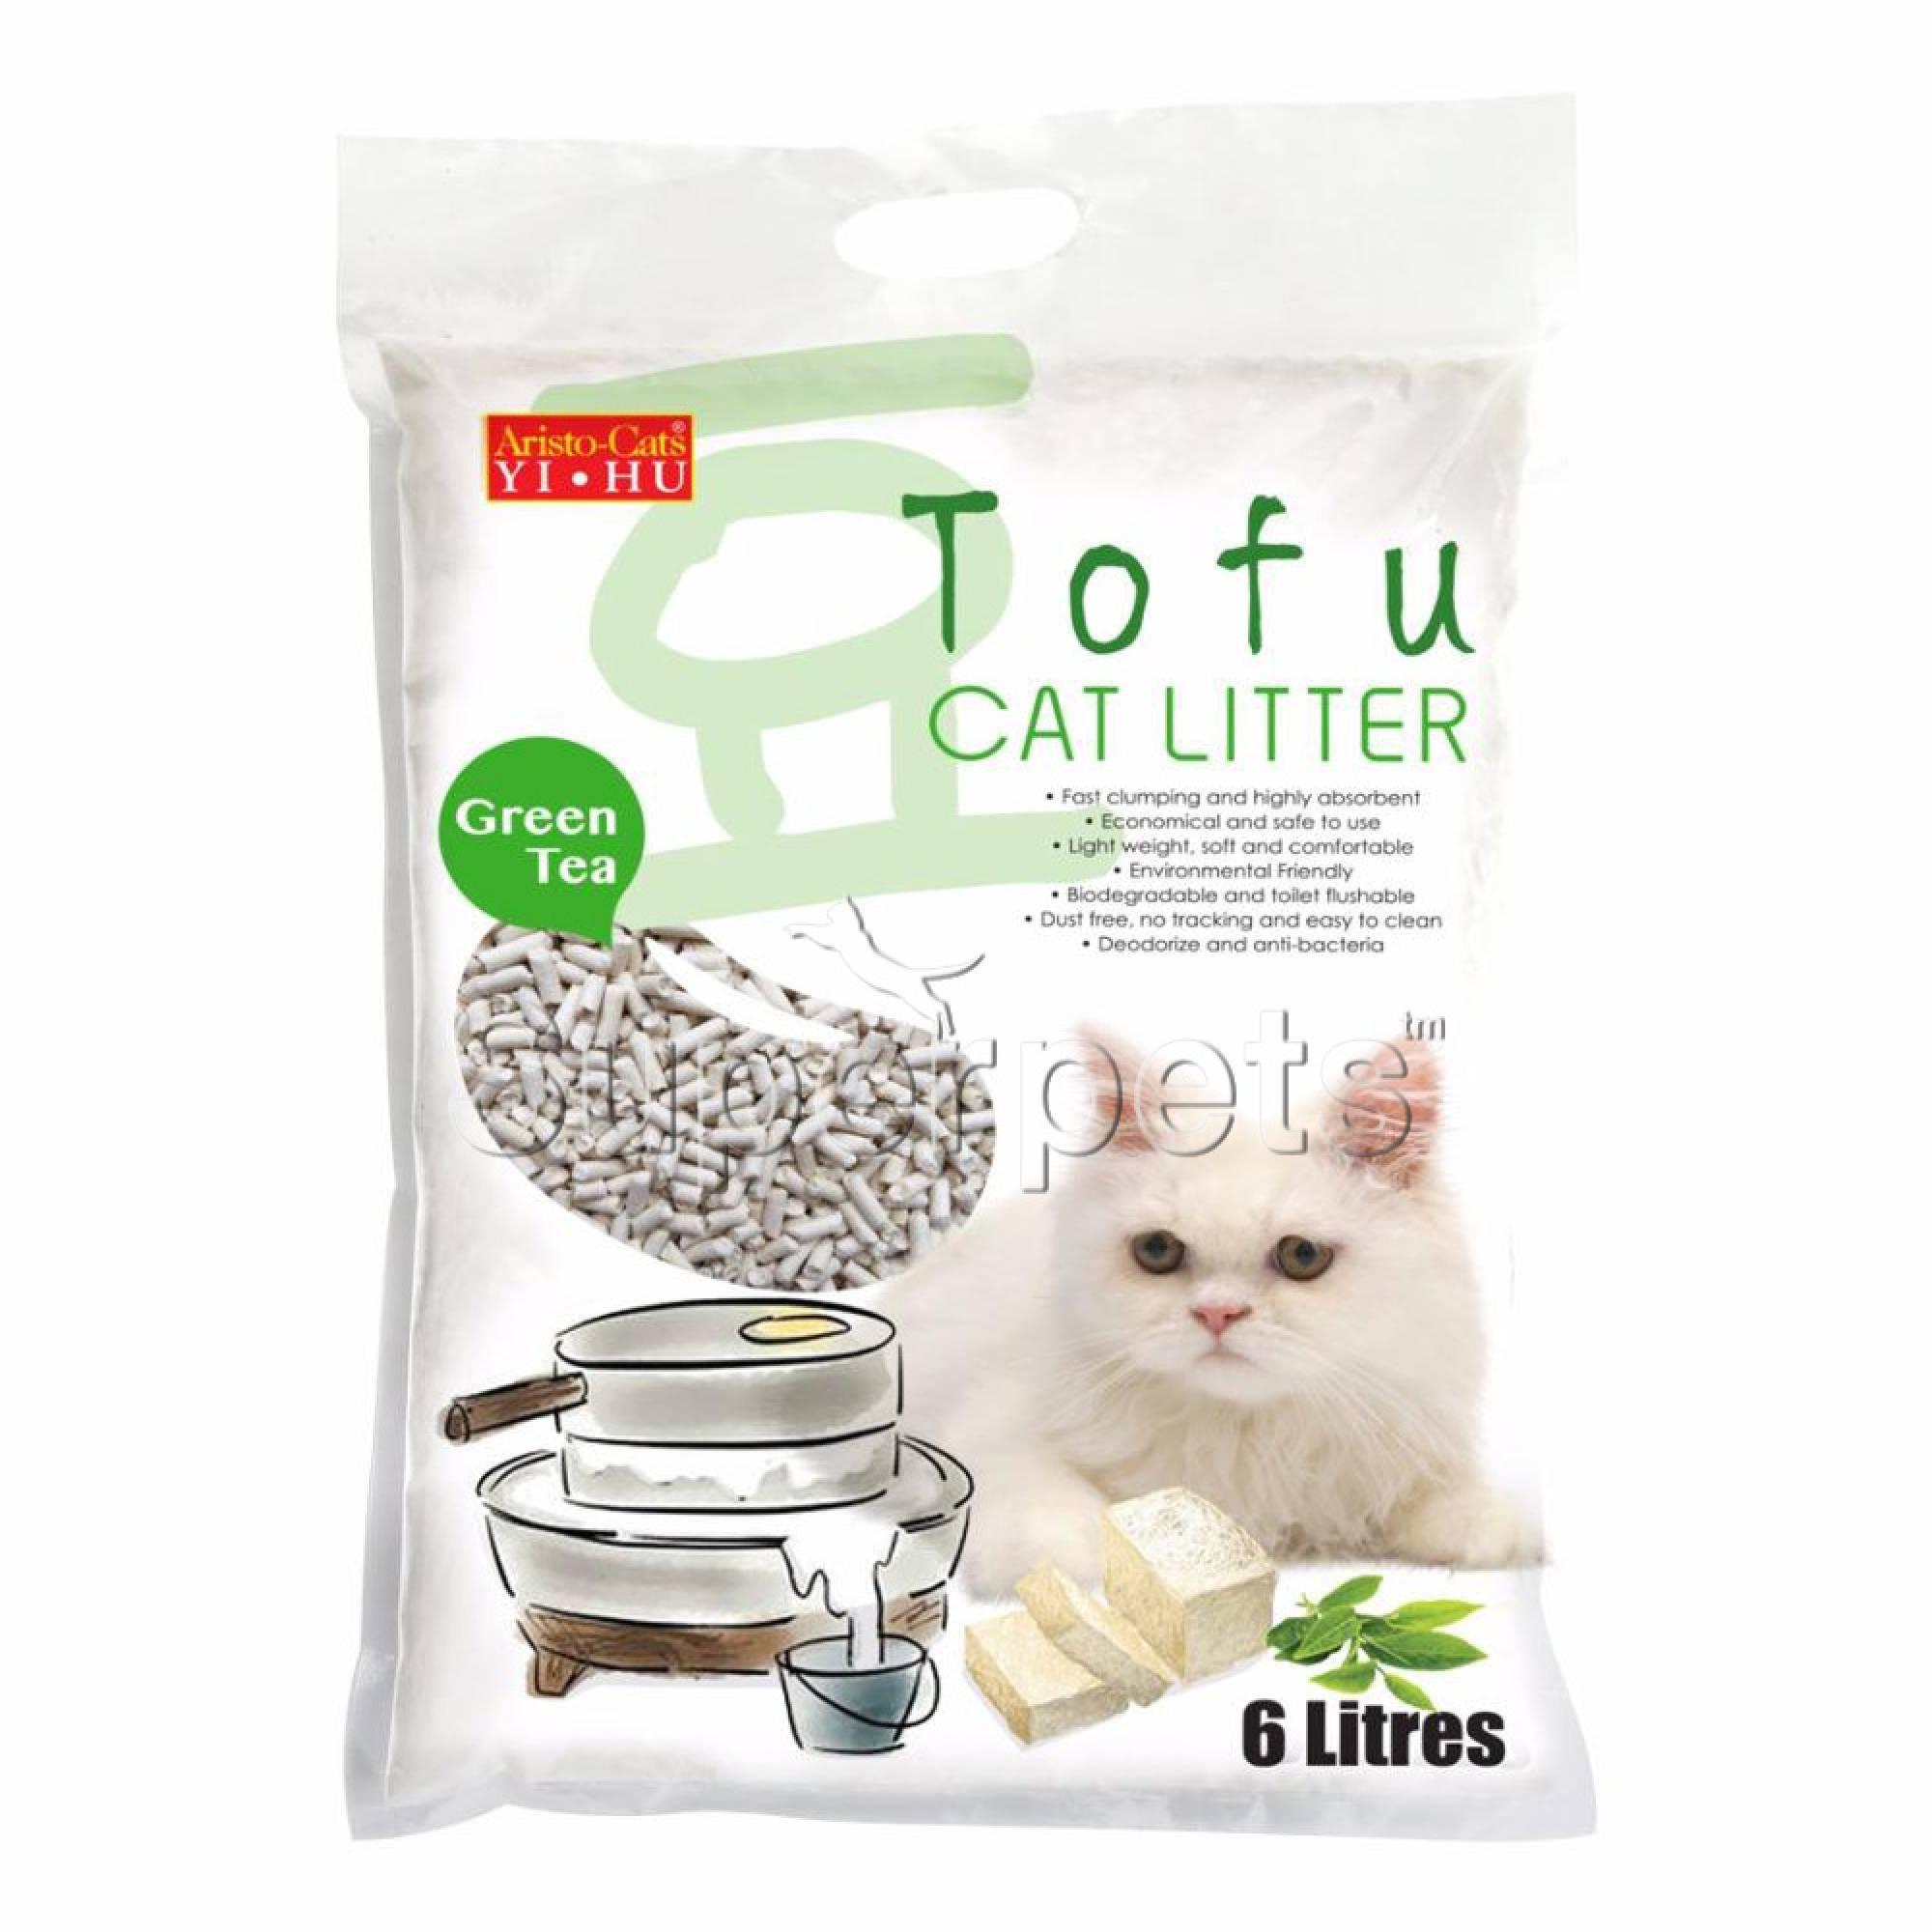 Aristo-Cats - Tofu Cat Litter - Green Tea 6L